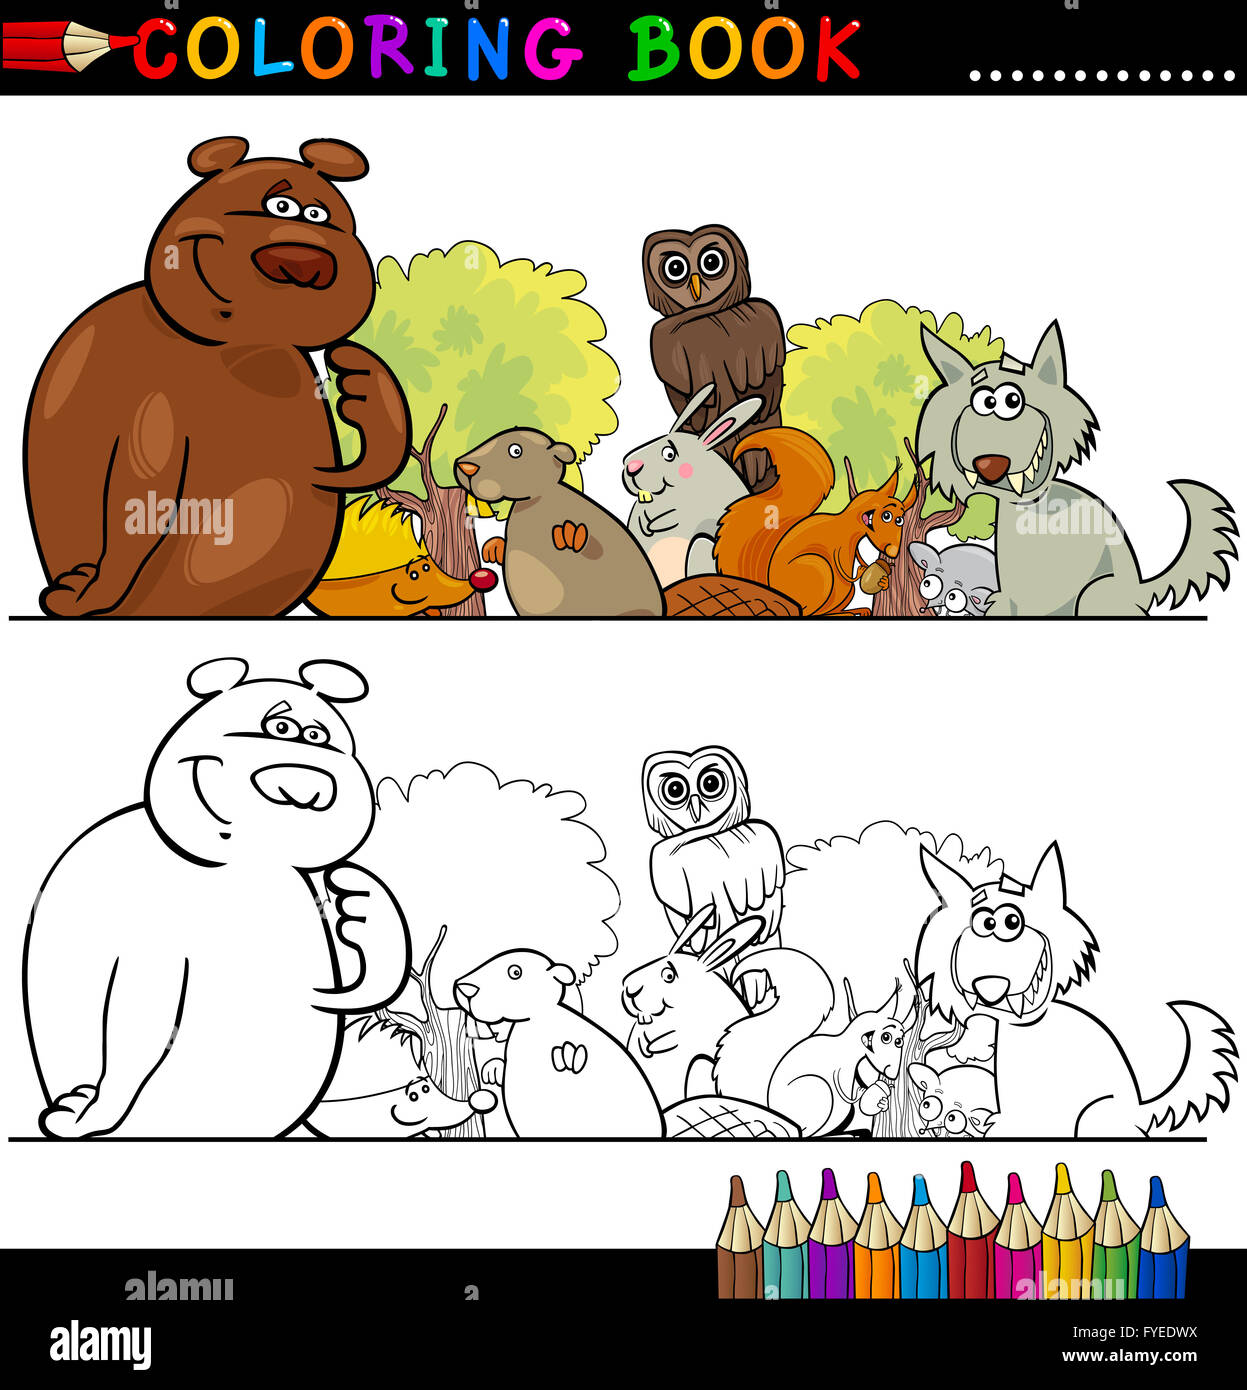 Beaver Illustration Graphic Imágenes De Stock & Beaver Illustration ...